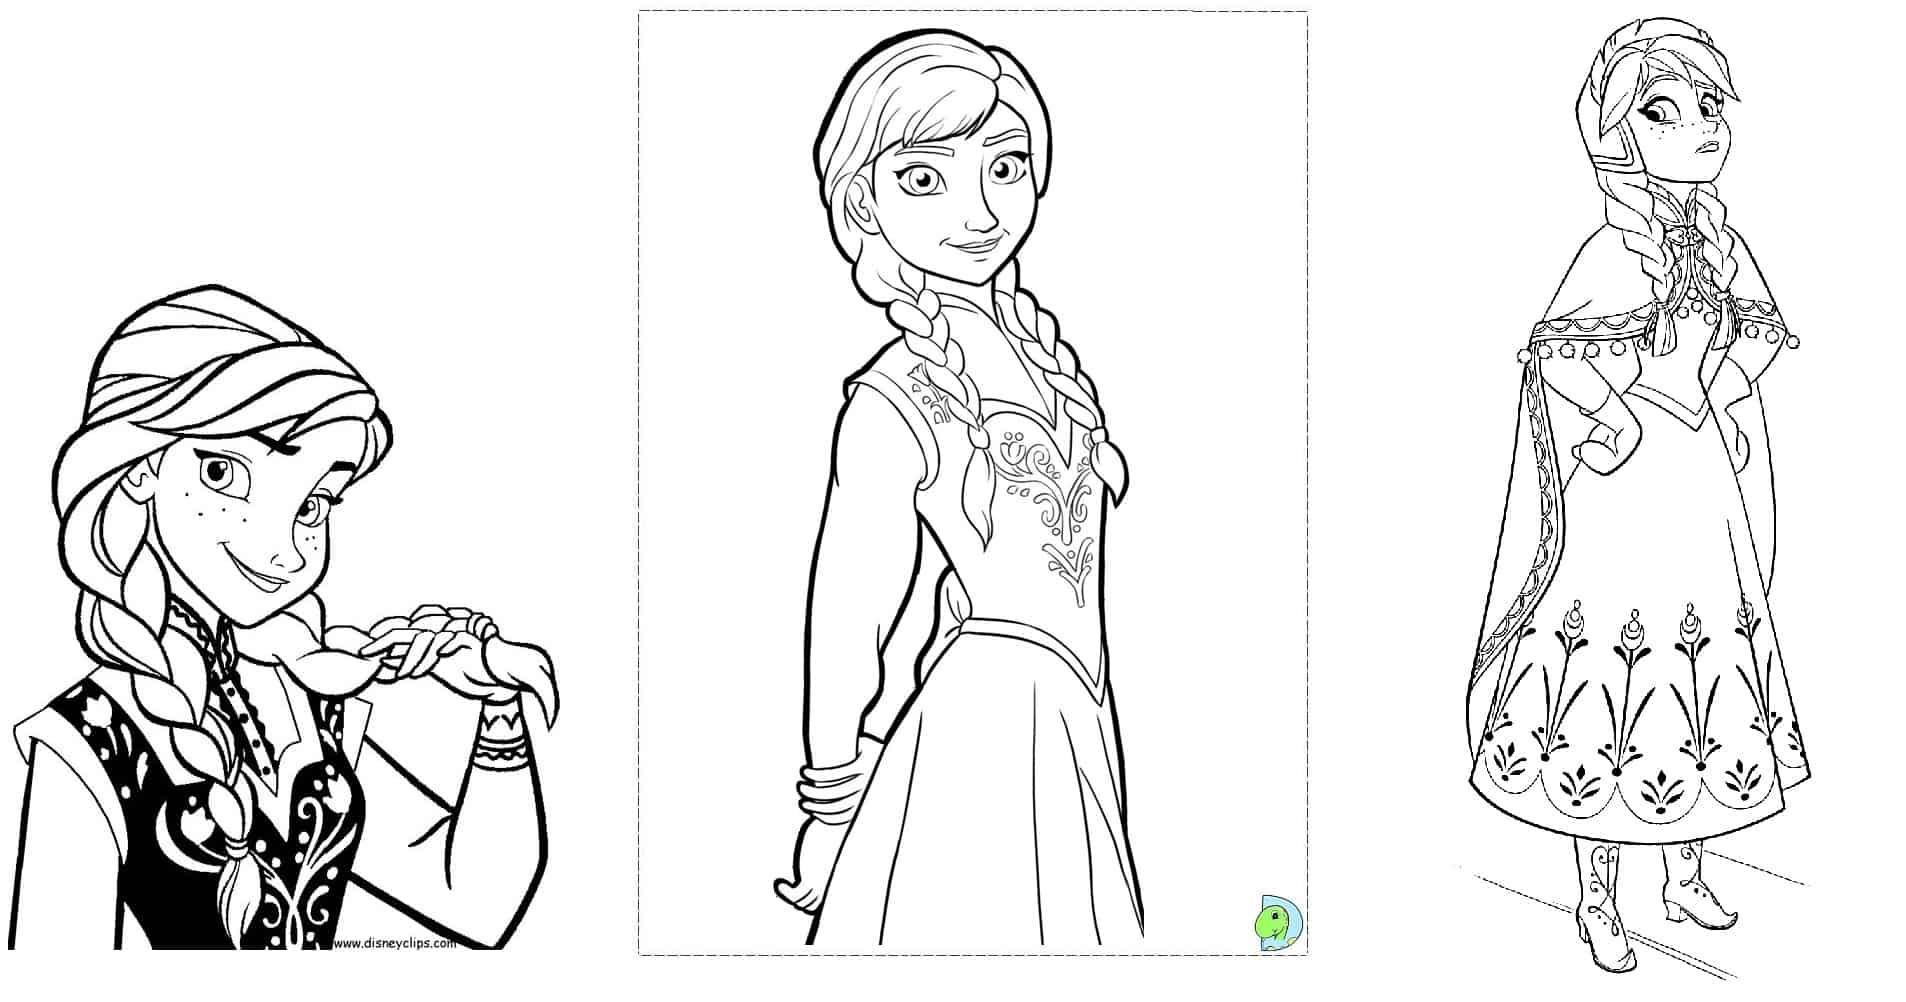 Desenhos Para Colorir Frozen: 55 Modelos Para Imprimir